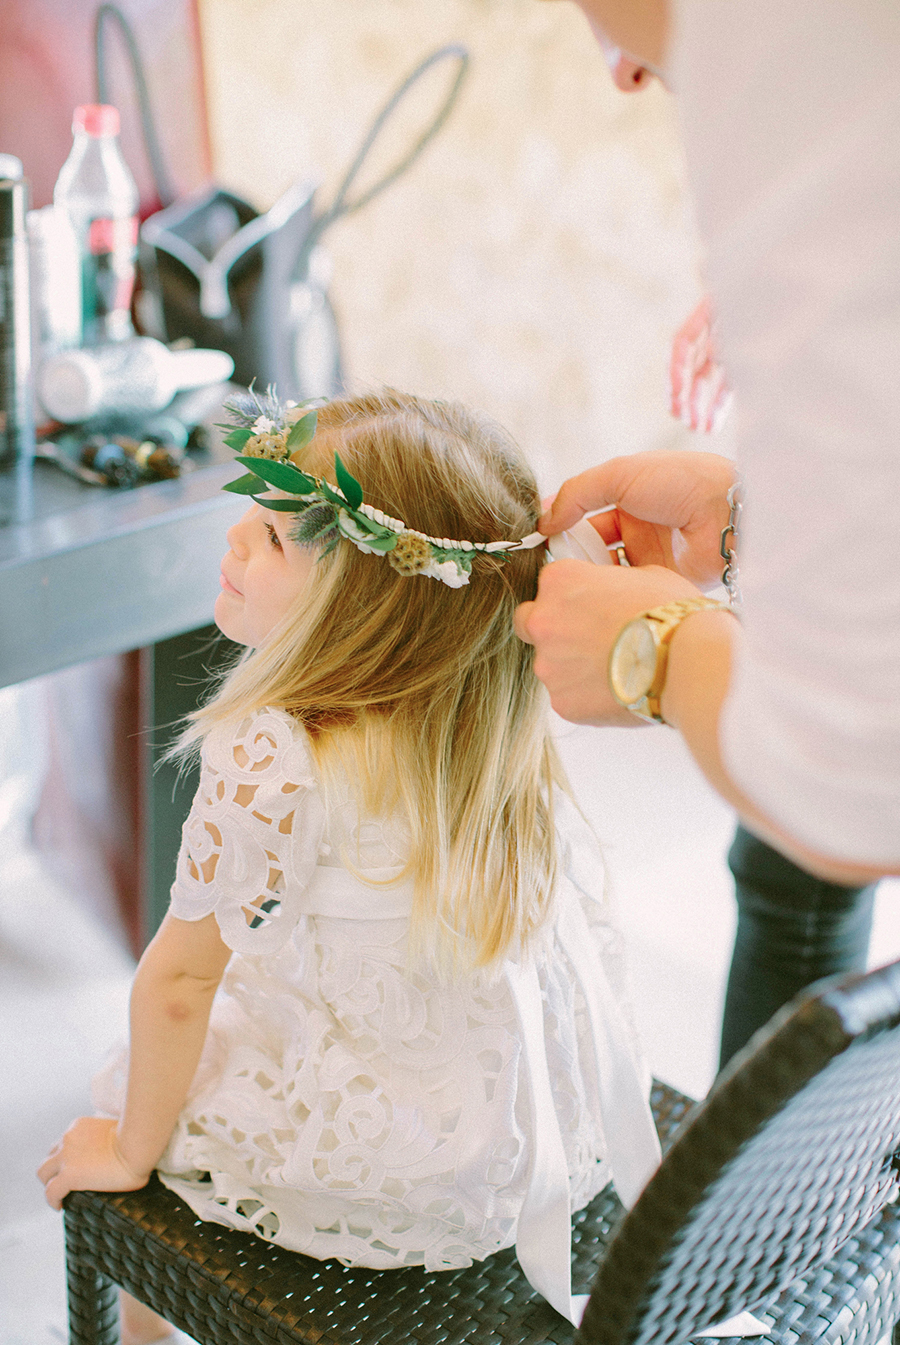 ©-saya-photography-studio-ohlala-wedding-photographer-photographe-mariage-lourmarin-avignon-provence-le-galinier-16.jpg